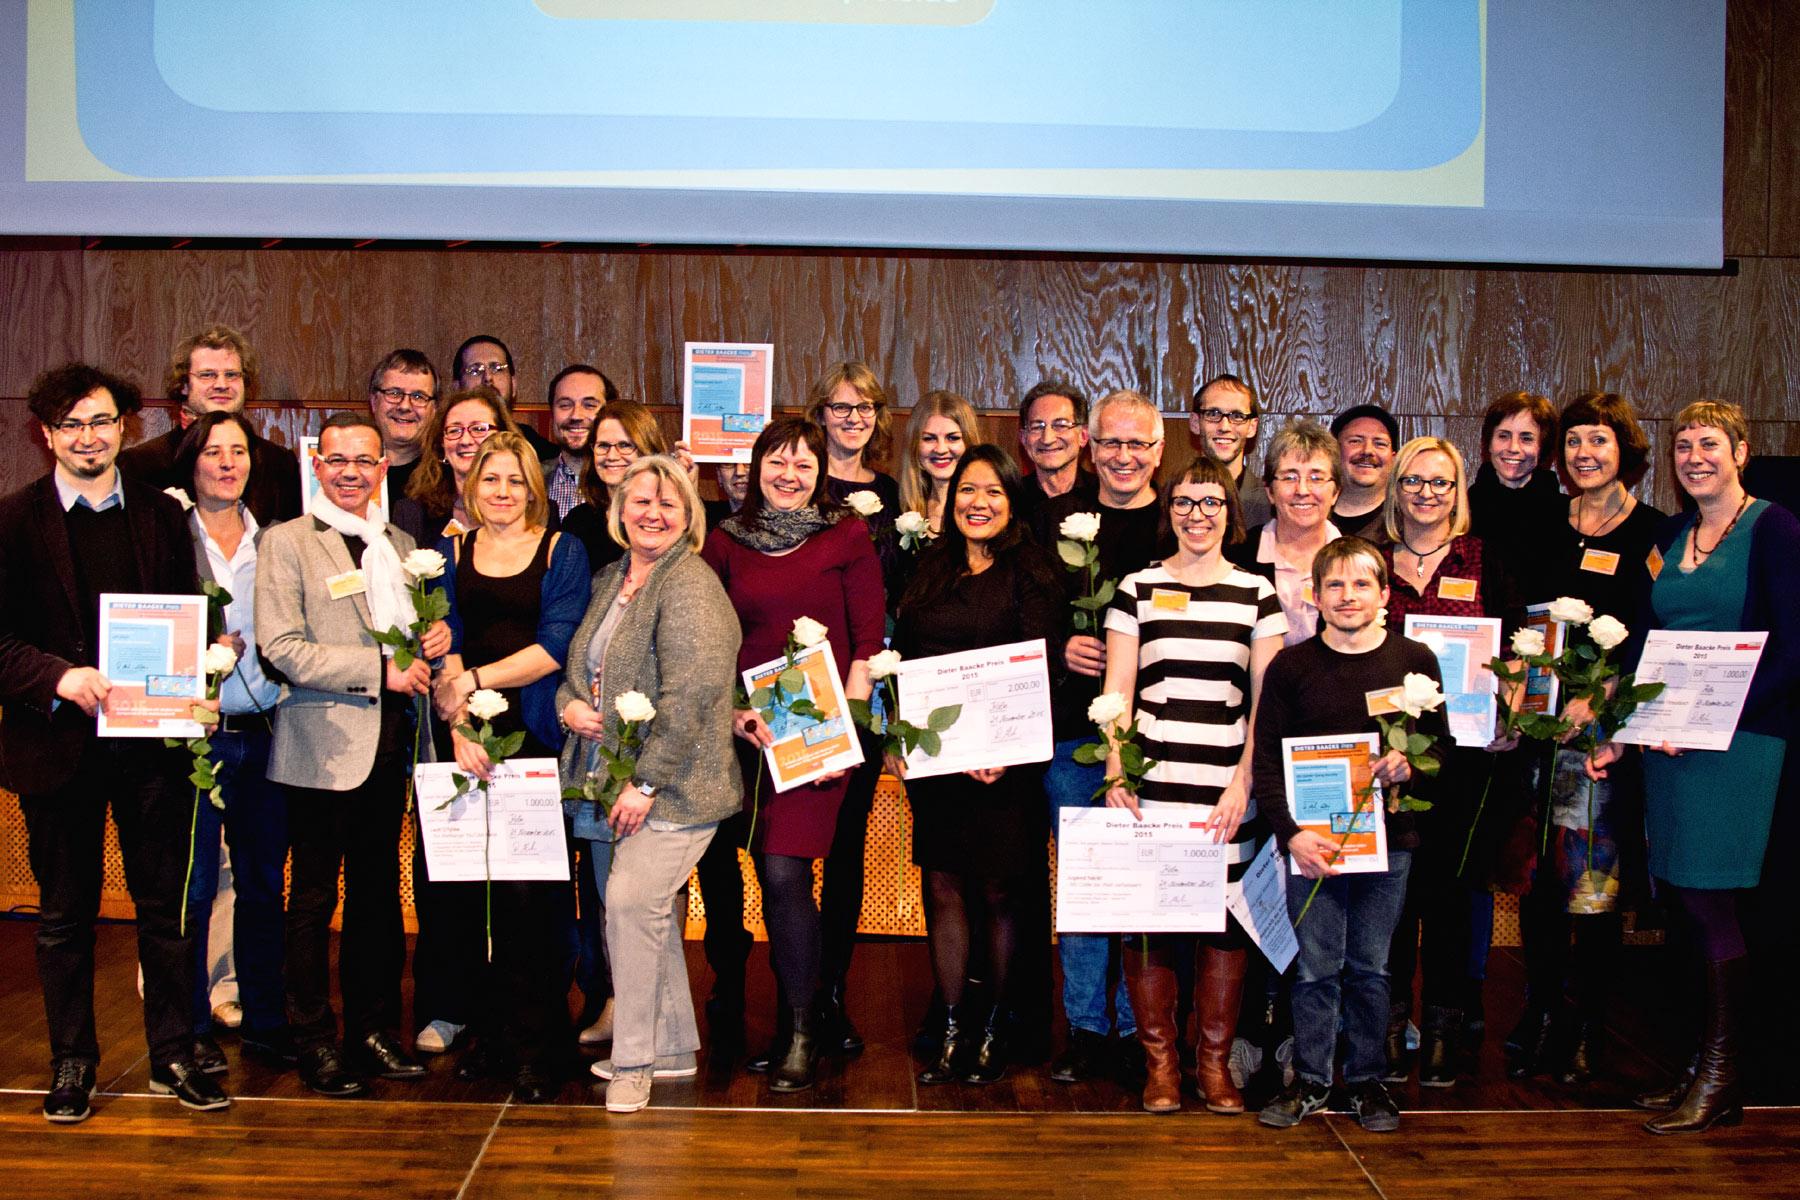 Klickvergrößernd: Preisträger Dieter Baacke Preis während des 32. Forums Kommunikationskultur der GMK 2015 © GMK/Kristin Grunert